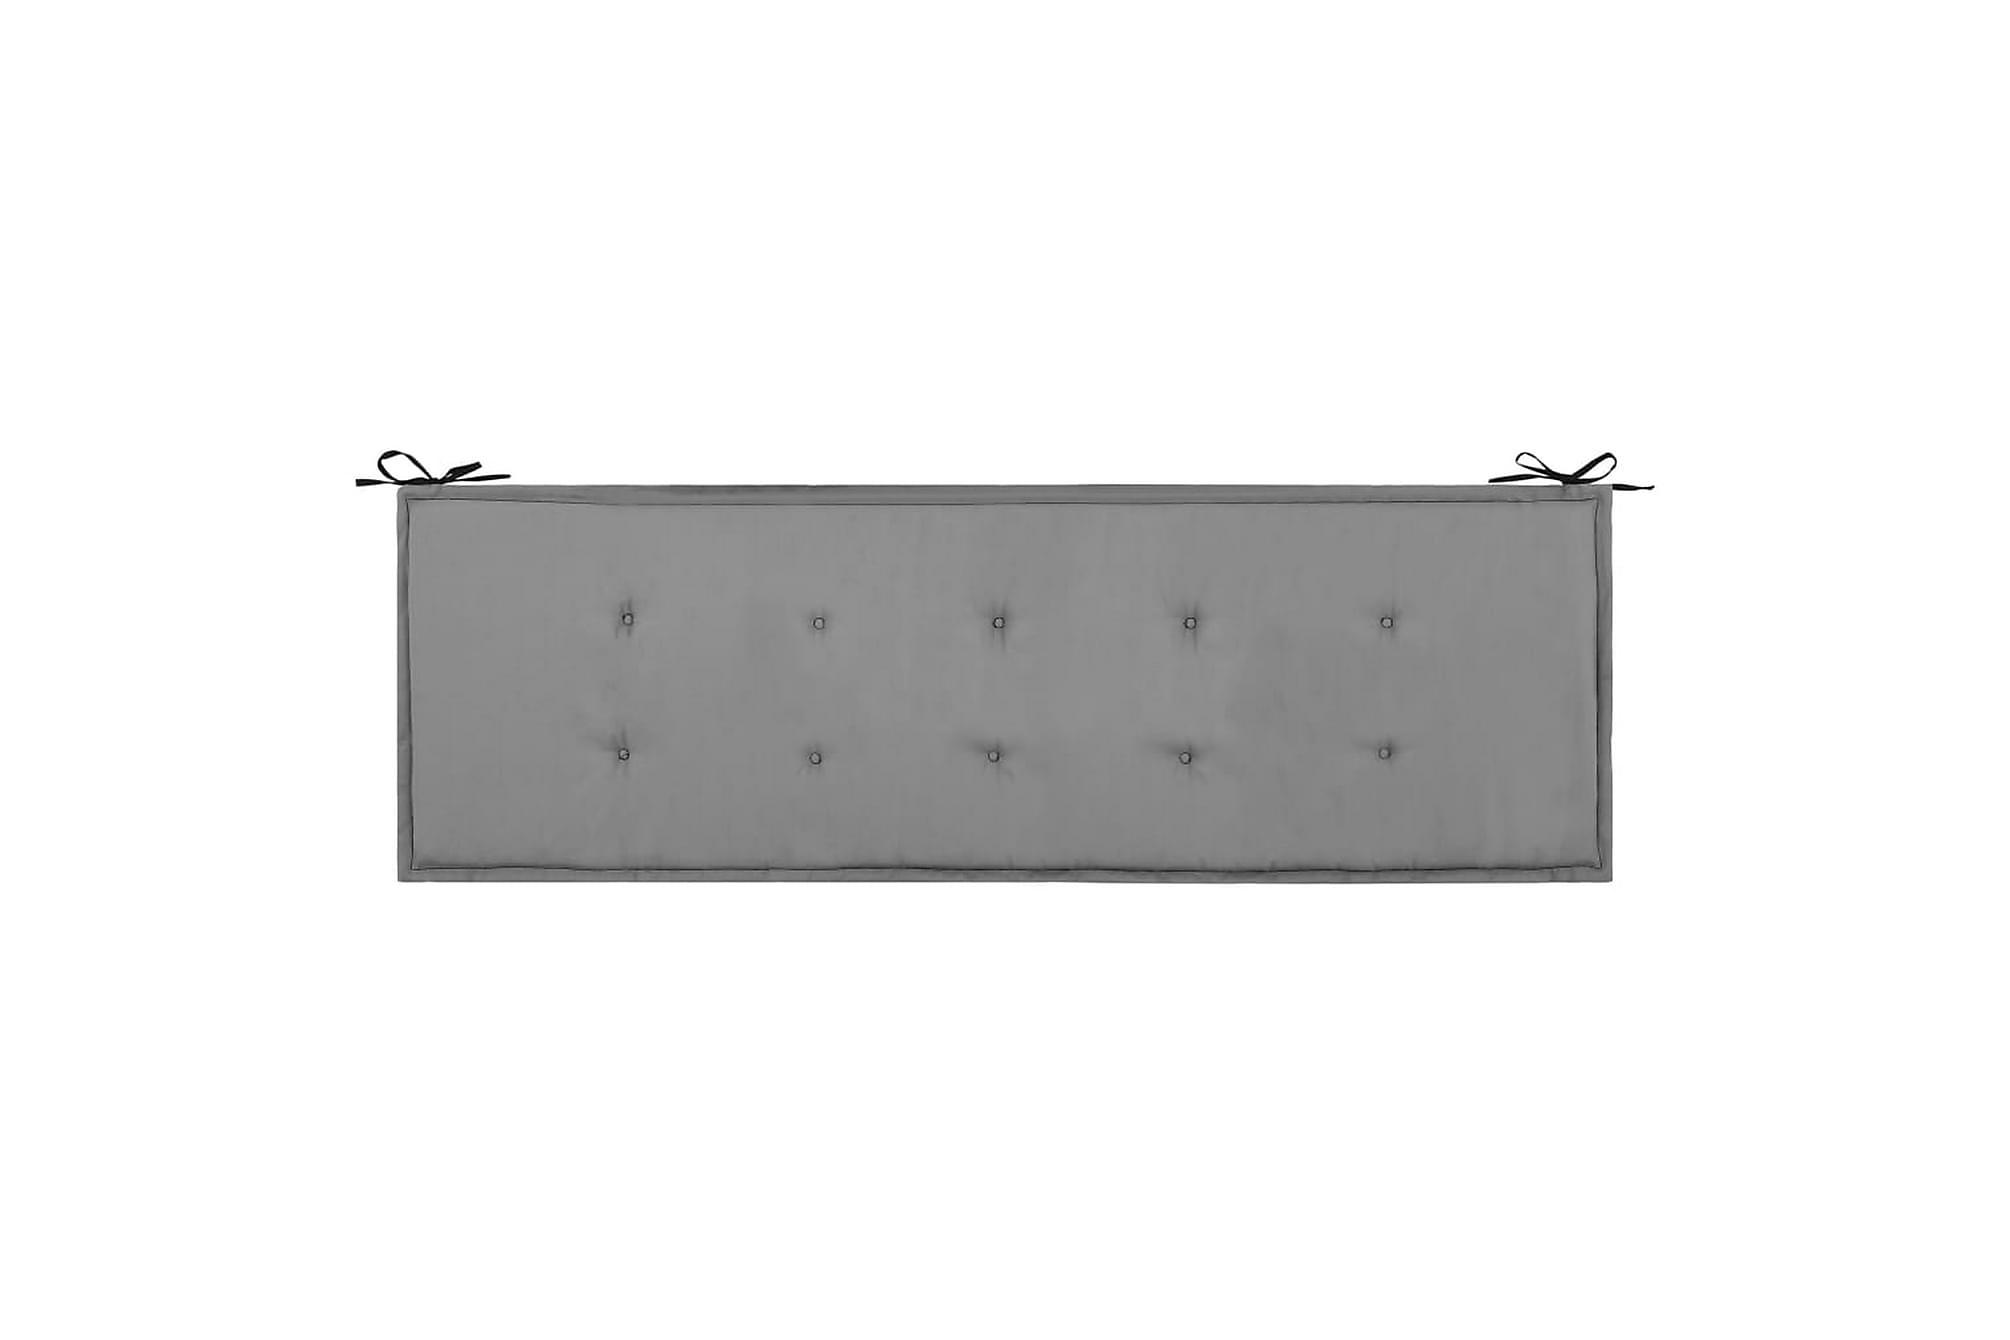 Bänkdyna för trädgården svart och grå 150x50x3 cm, Soffdynor